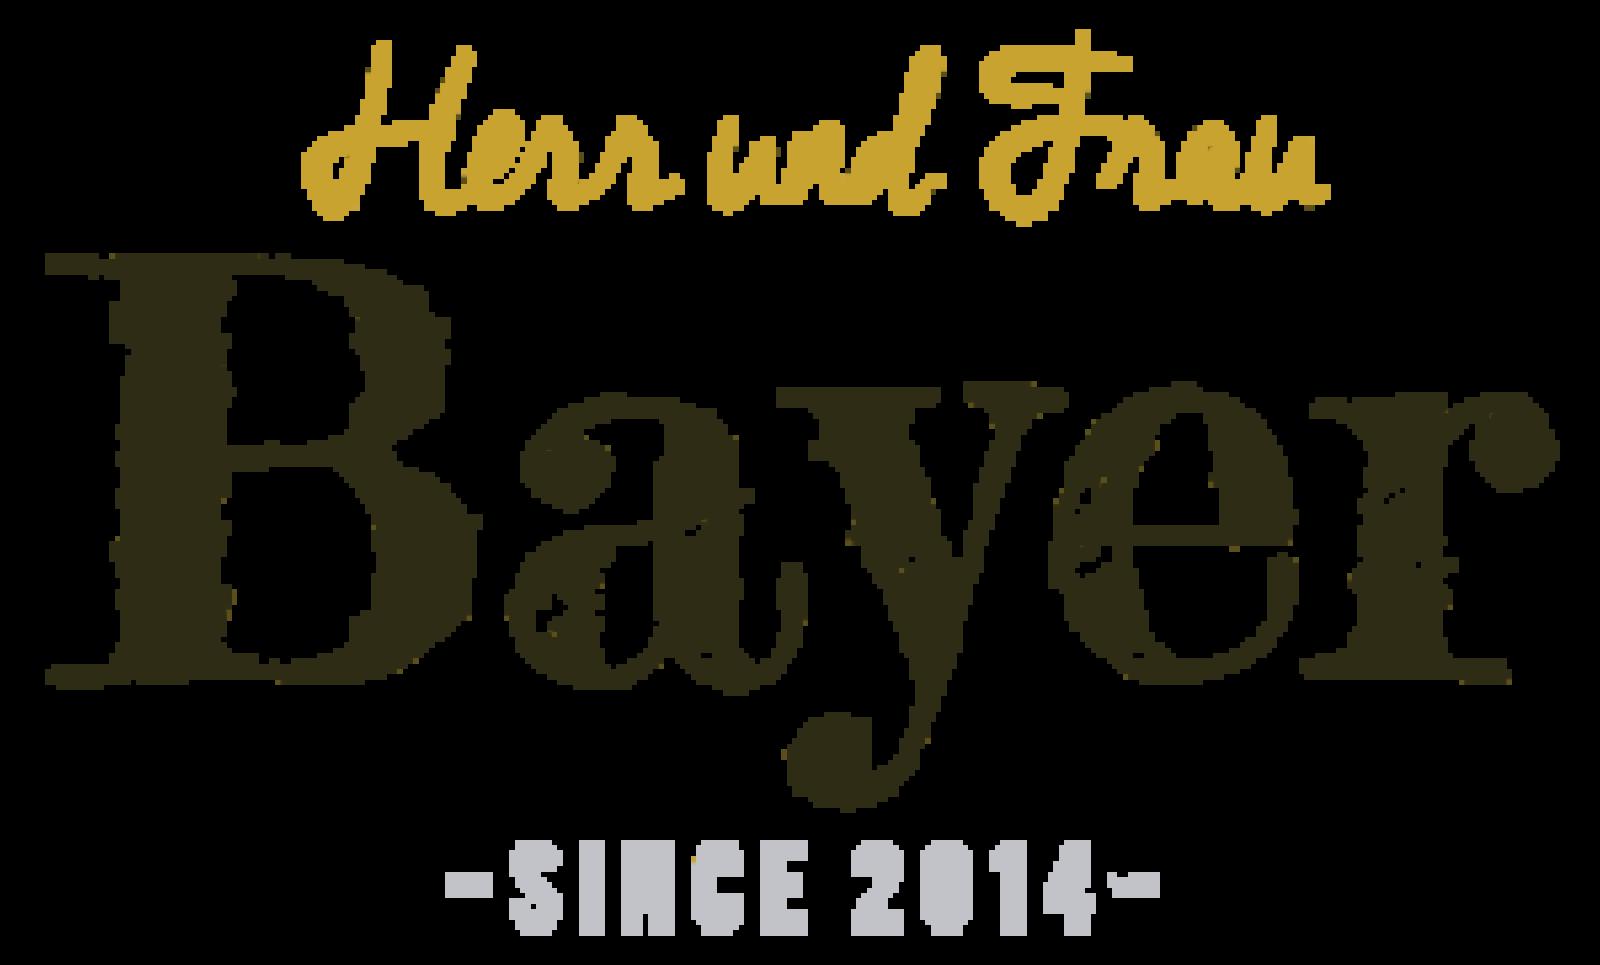 Herr und Frau Bayer